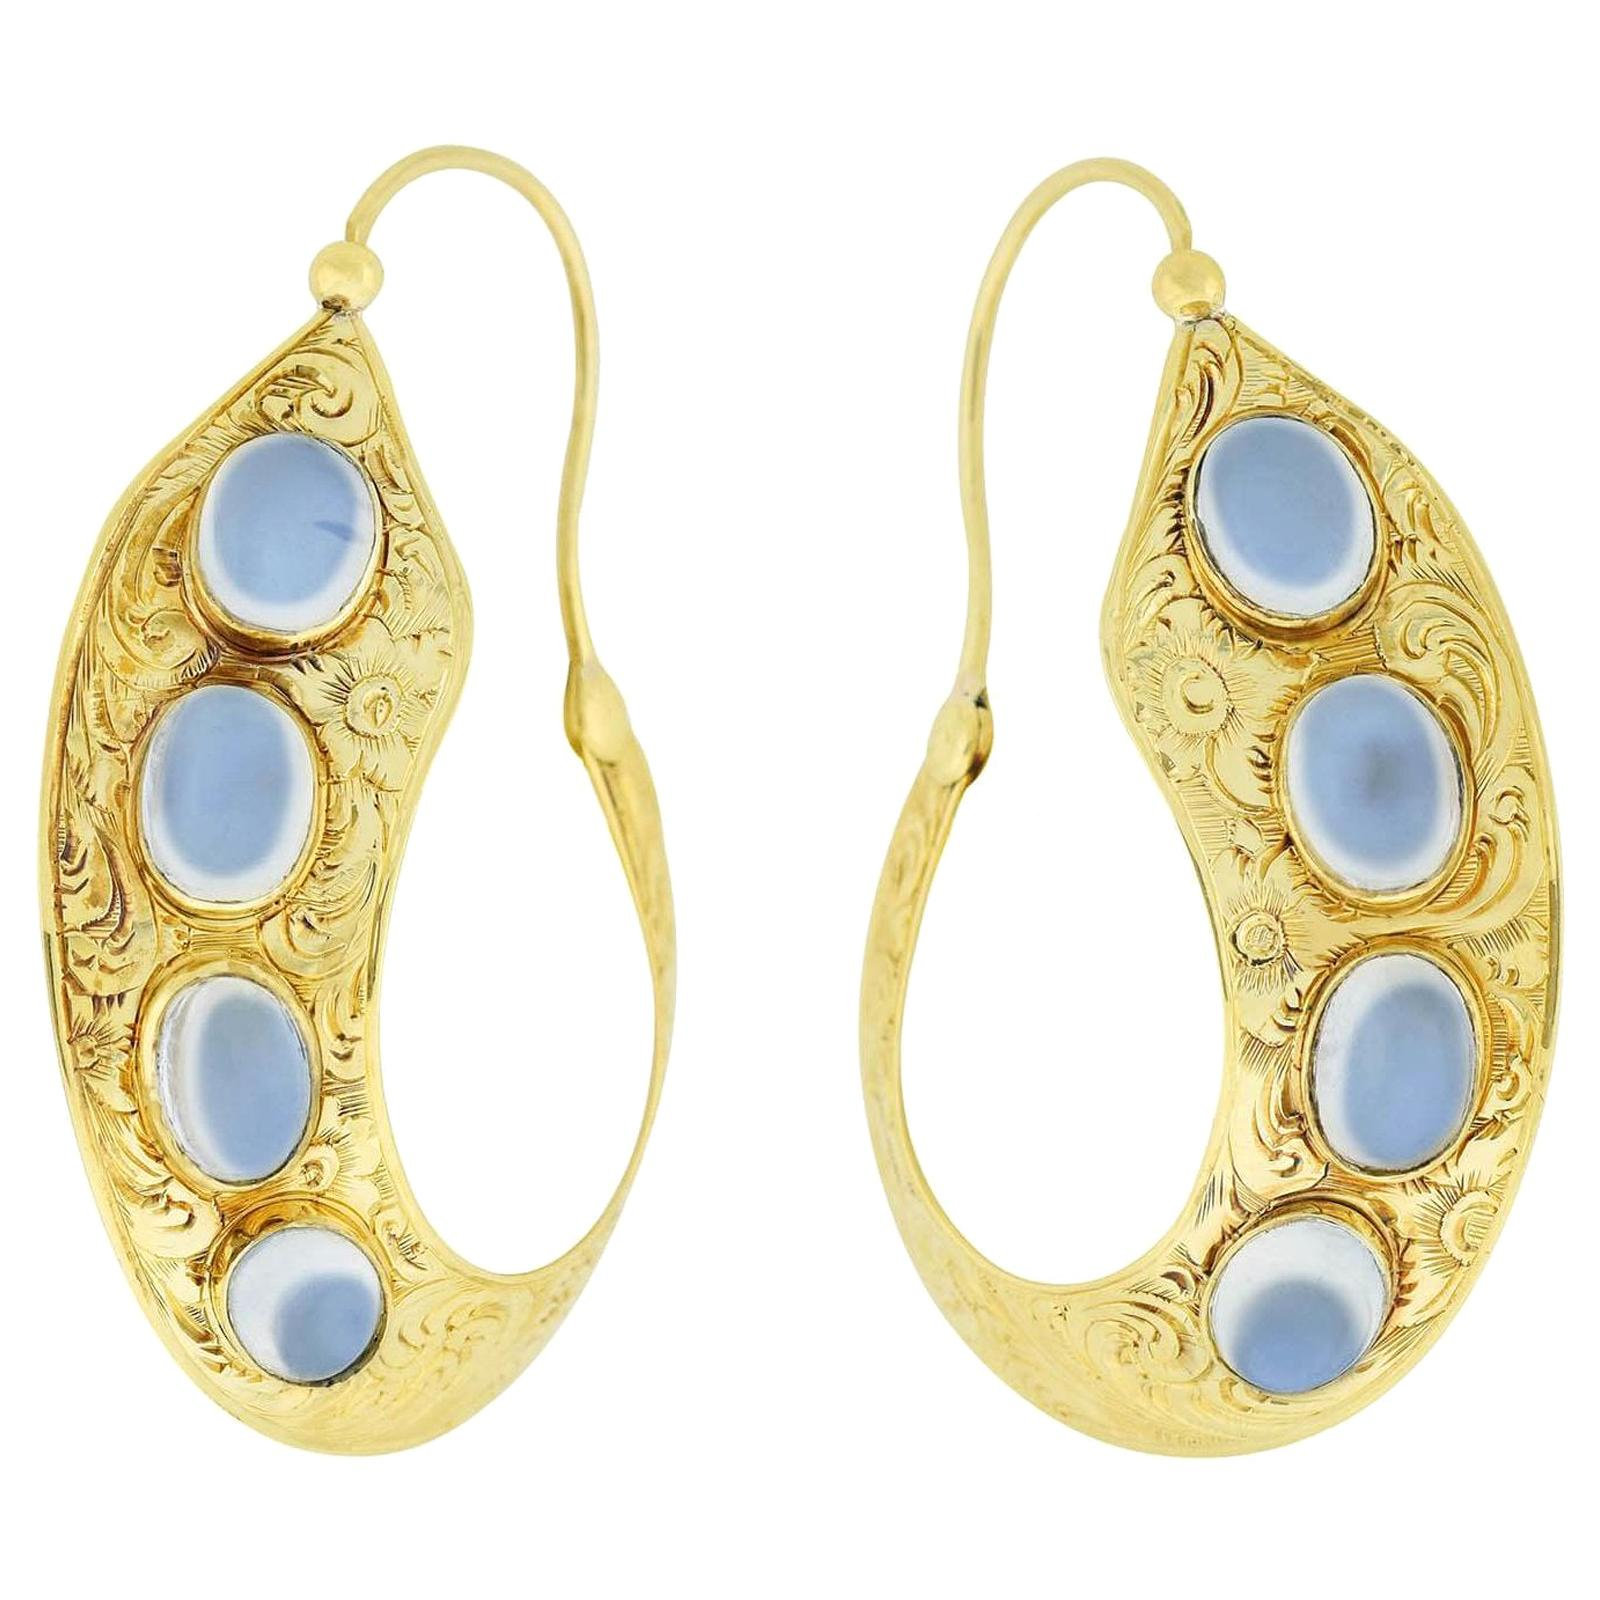 Victorian 18 Karat Moonstone Etched Left Right Hoop Earrings